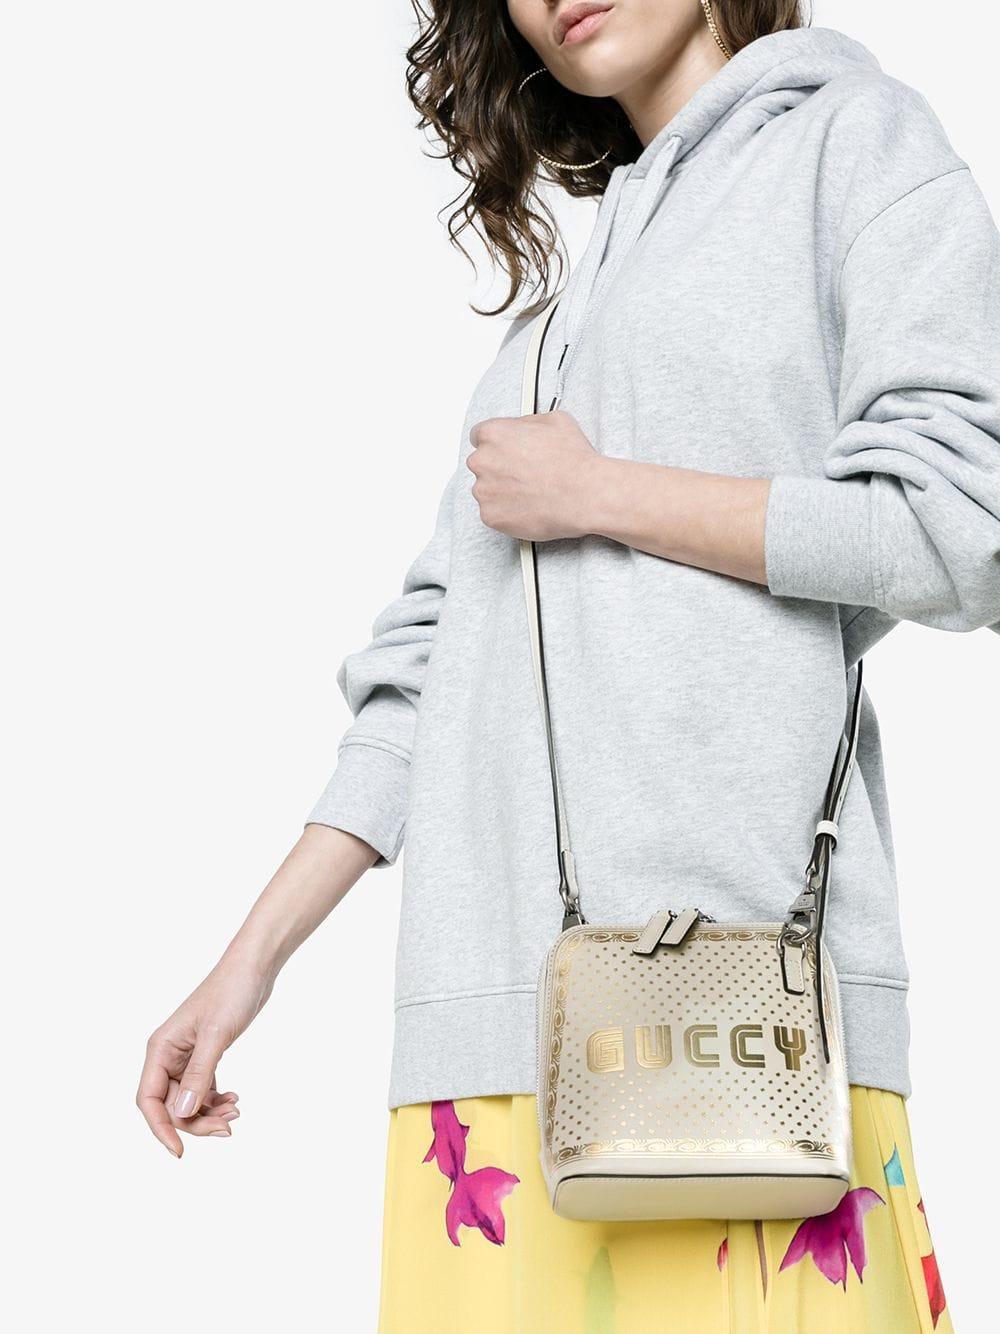 0985b03e9cf Lyst - Gucci White Guccy Mini Leather Shoulder Bag in White